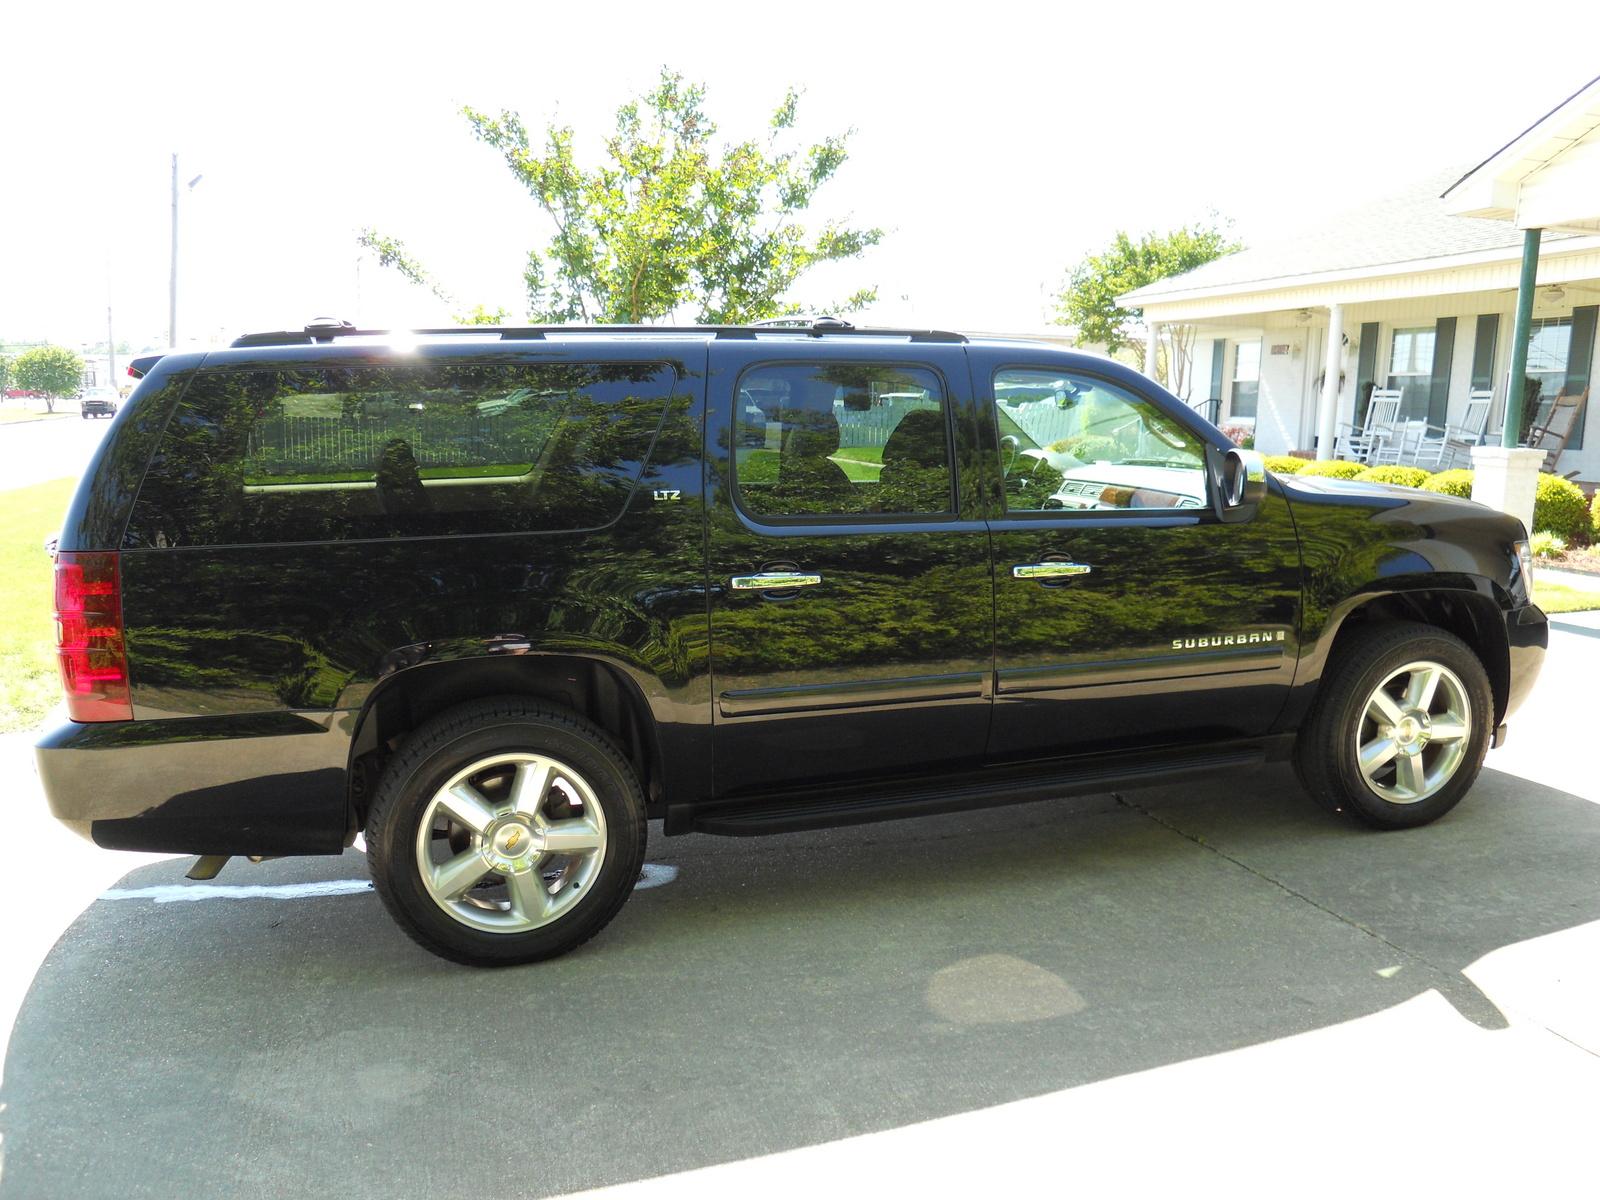 2008 chevrolet suburban ltz 1500 4wd for sale cargurus html autos post. Black Bedroom Furniture Sets. Home Design Ideas